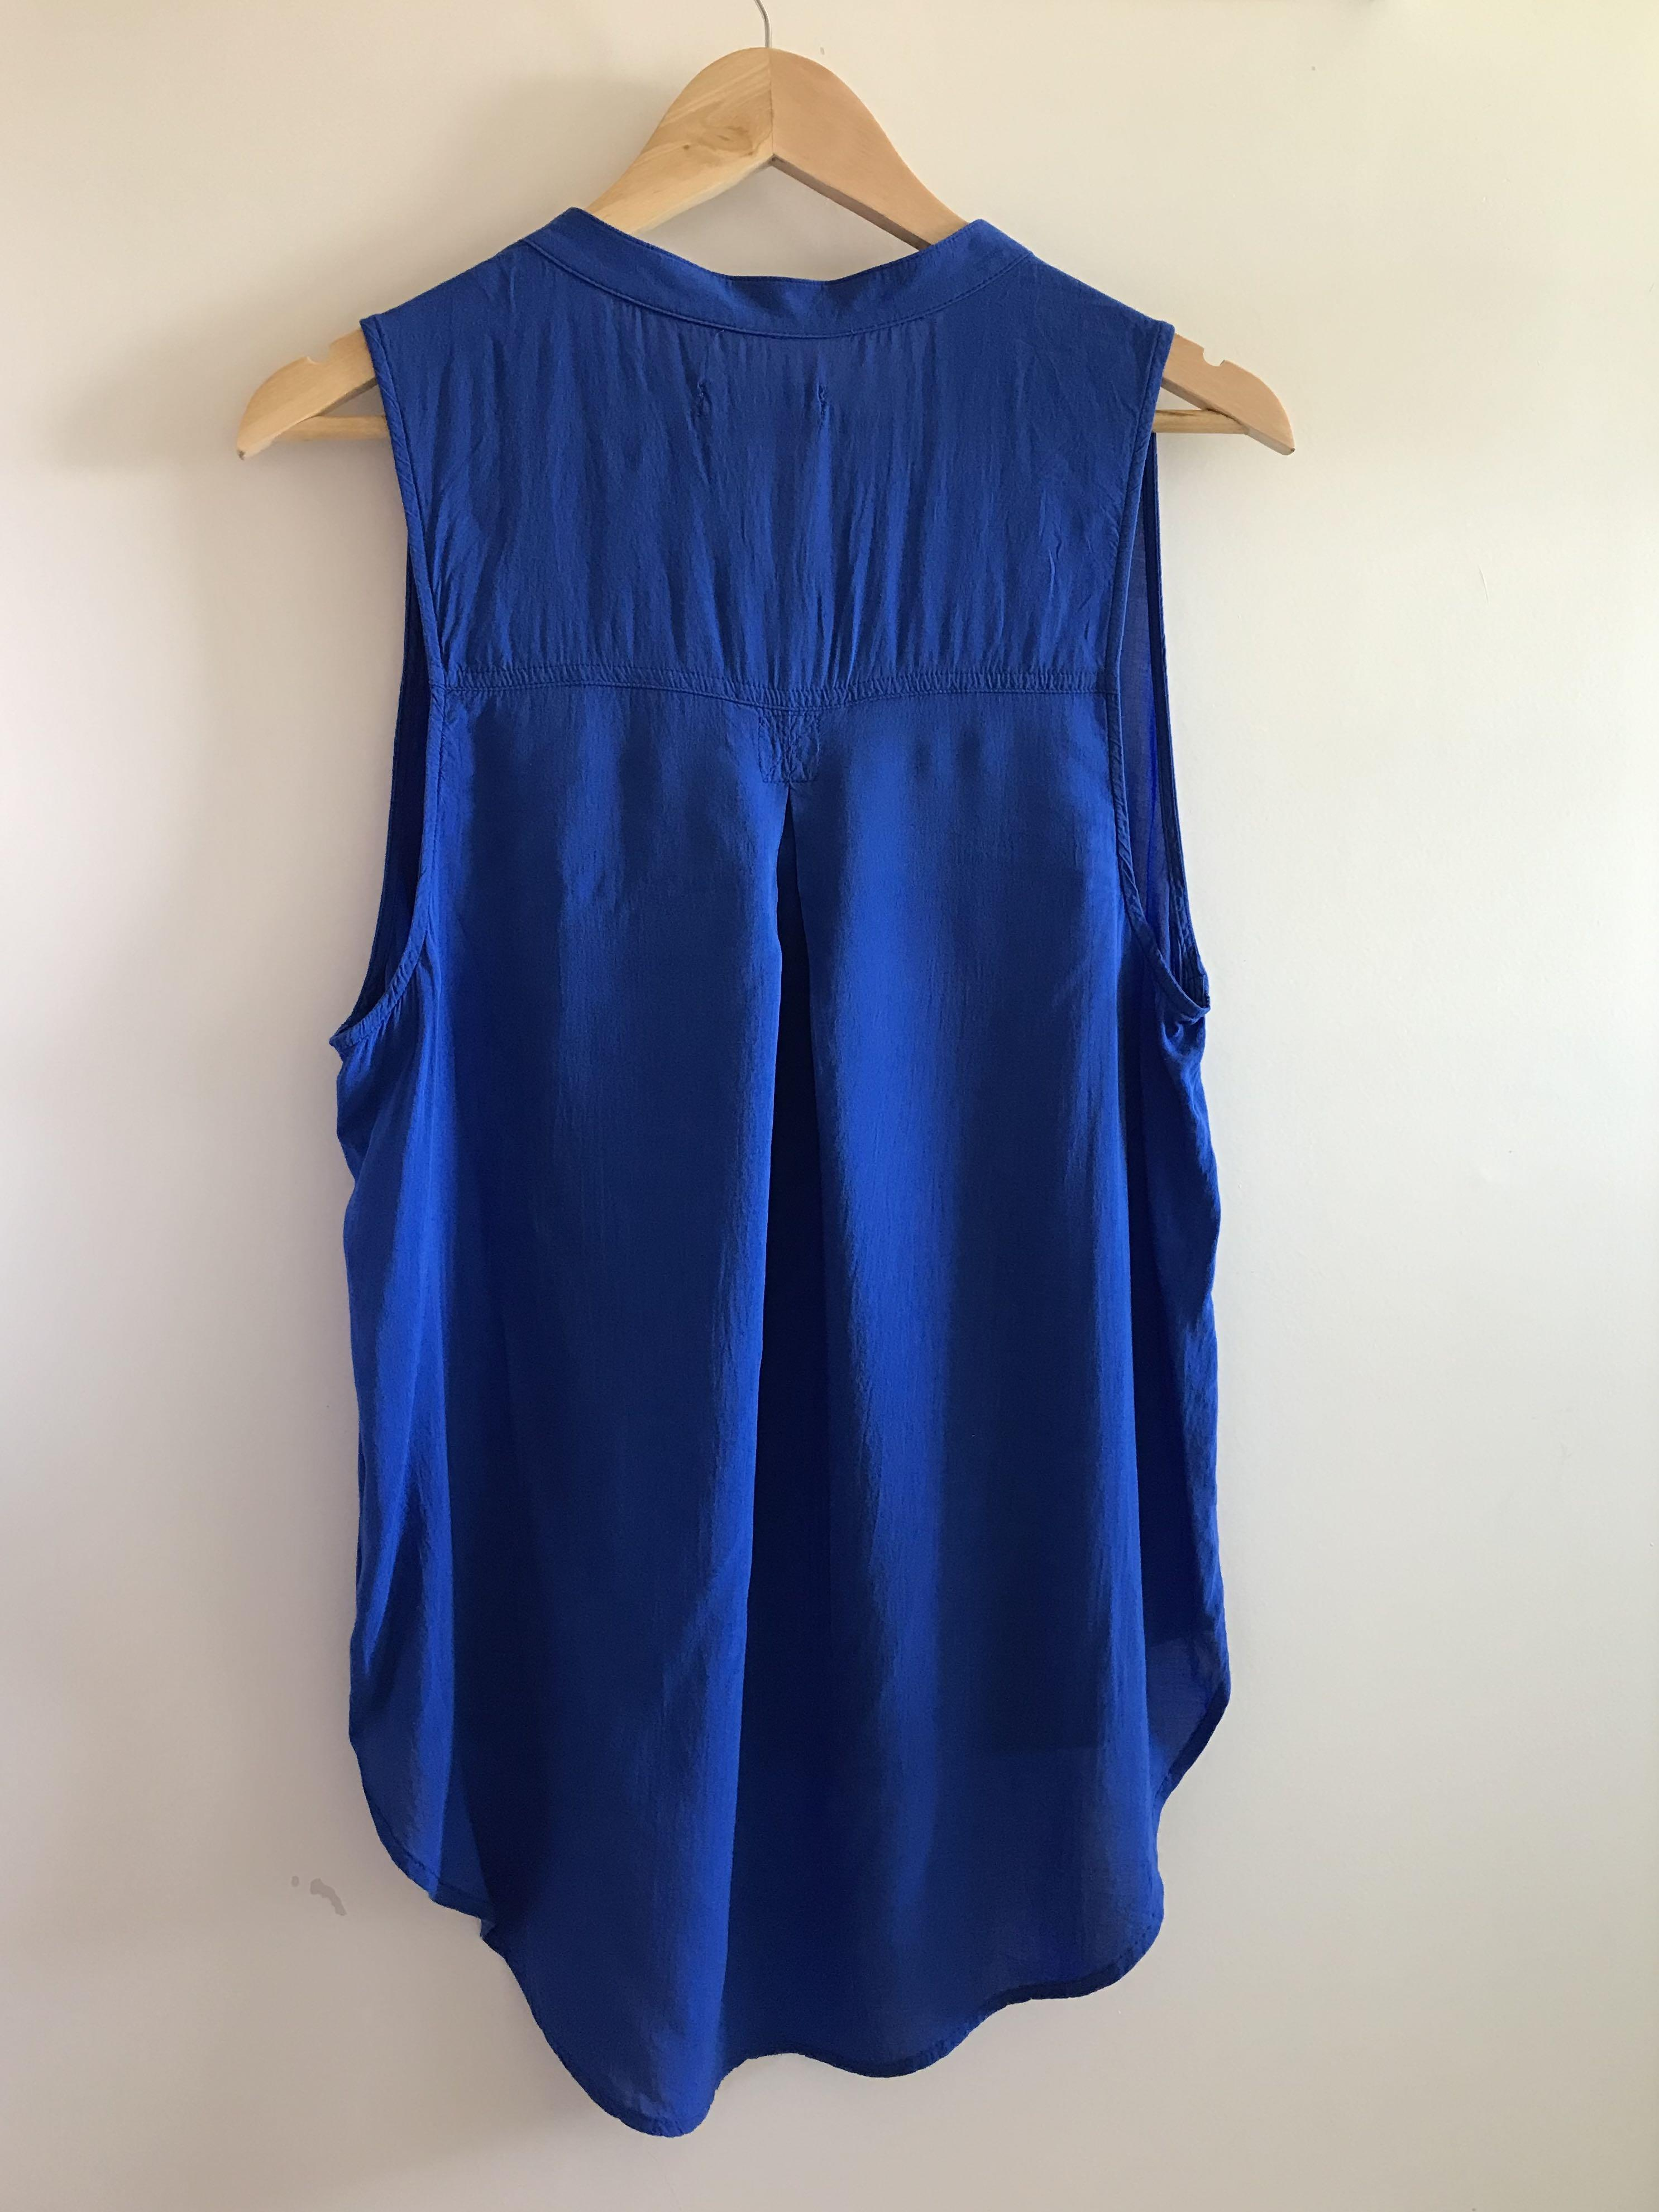 Sleeveless Blue Blouse